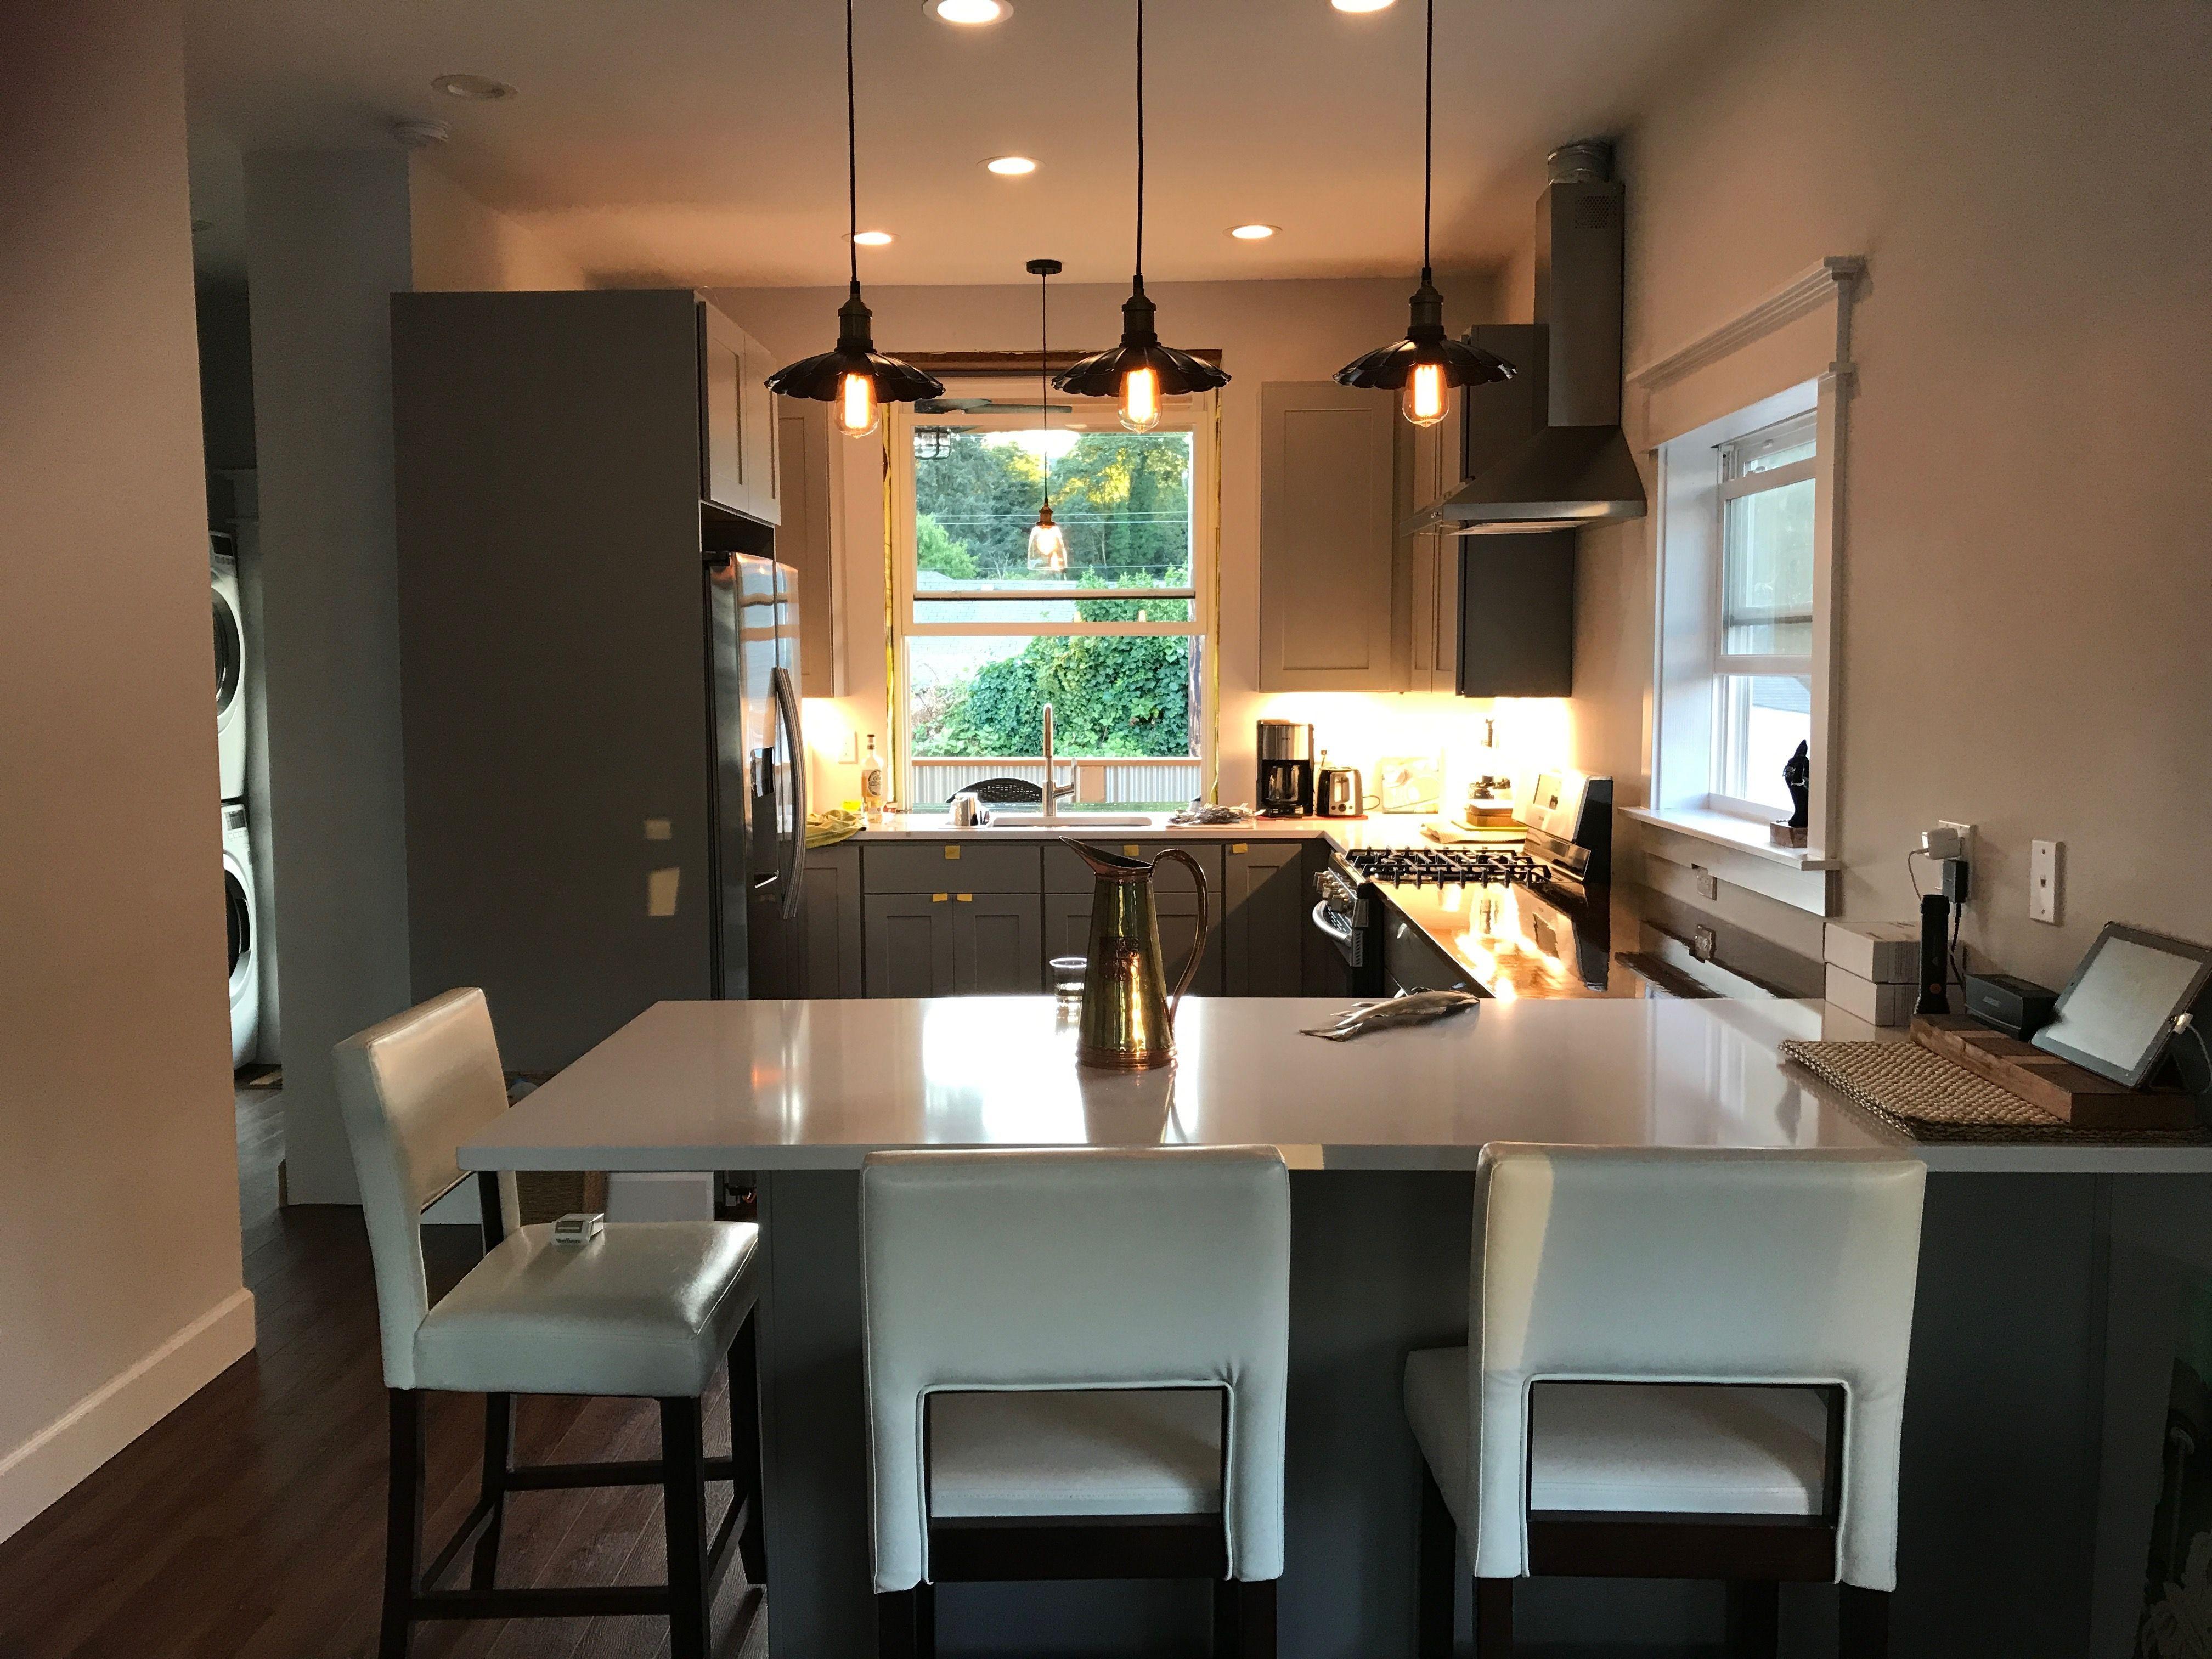 1910 oregon home renovation kitchen design 1910 oregon home renovation kitchen design   residential design by      rh   pinterest com